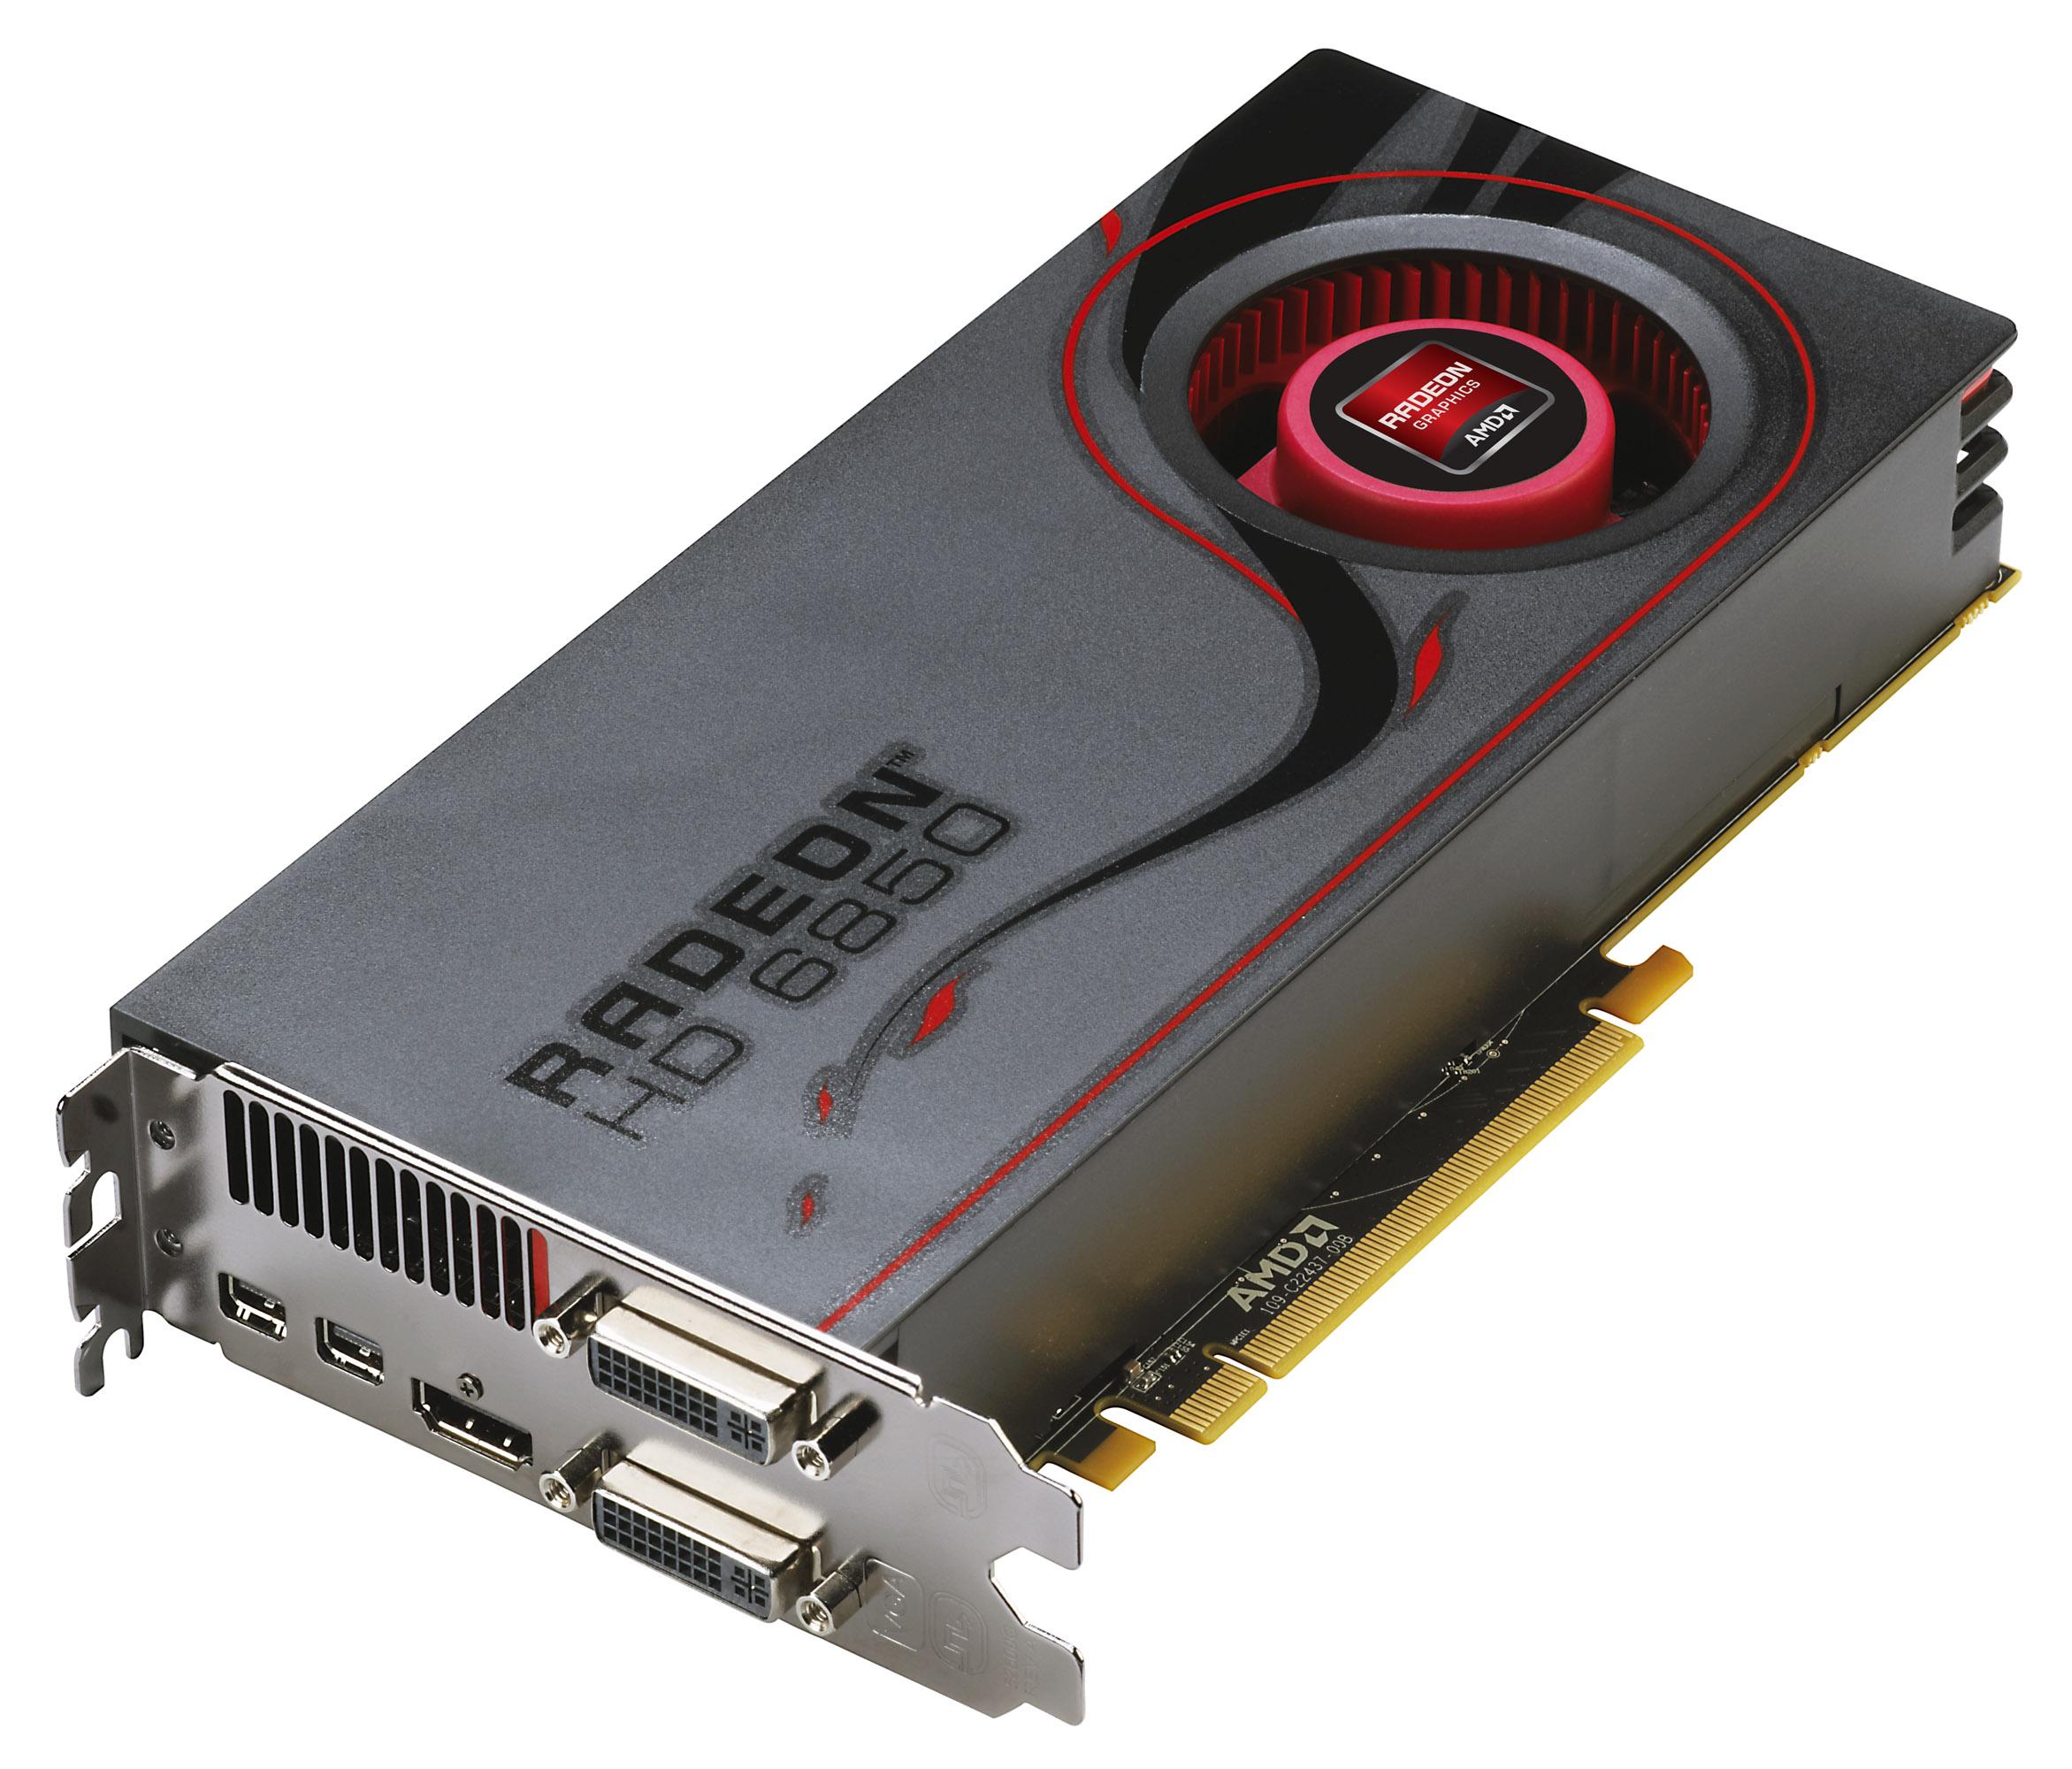 amd-radeon-hd_AMD Radeon HD 6800 series cards Official